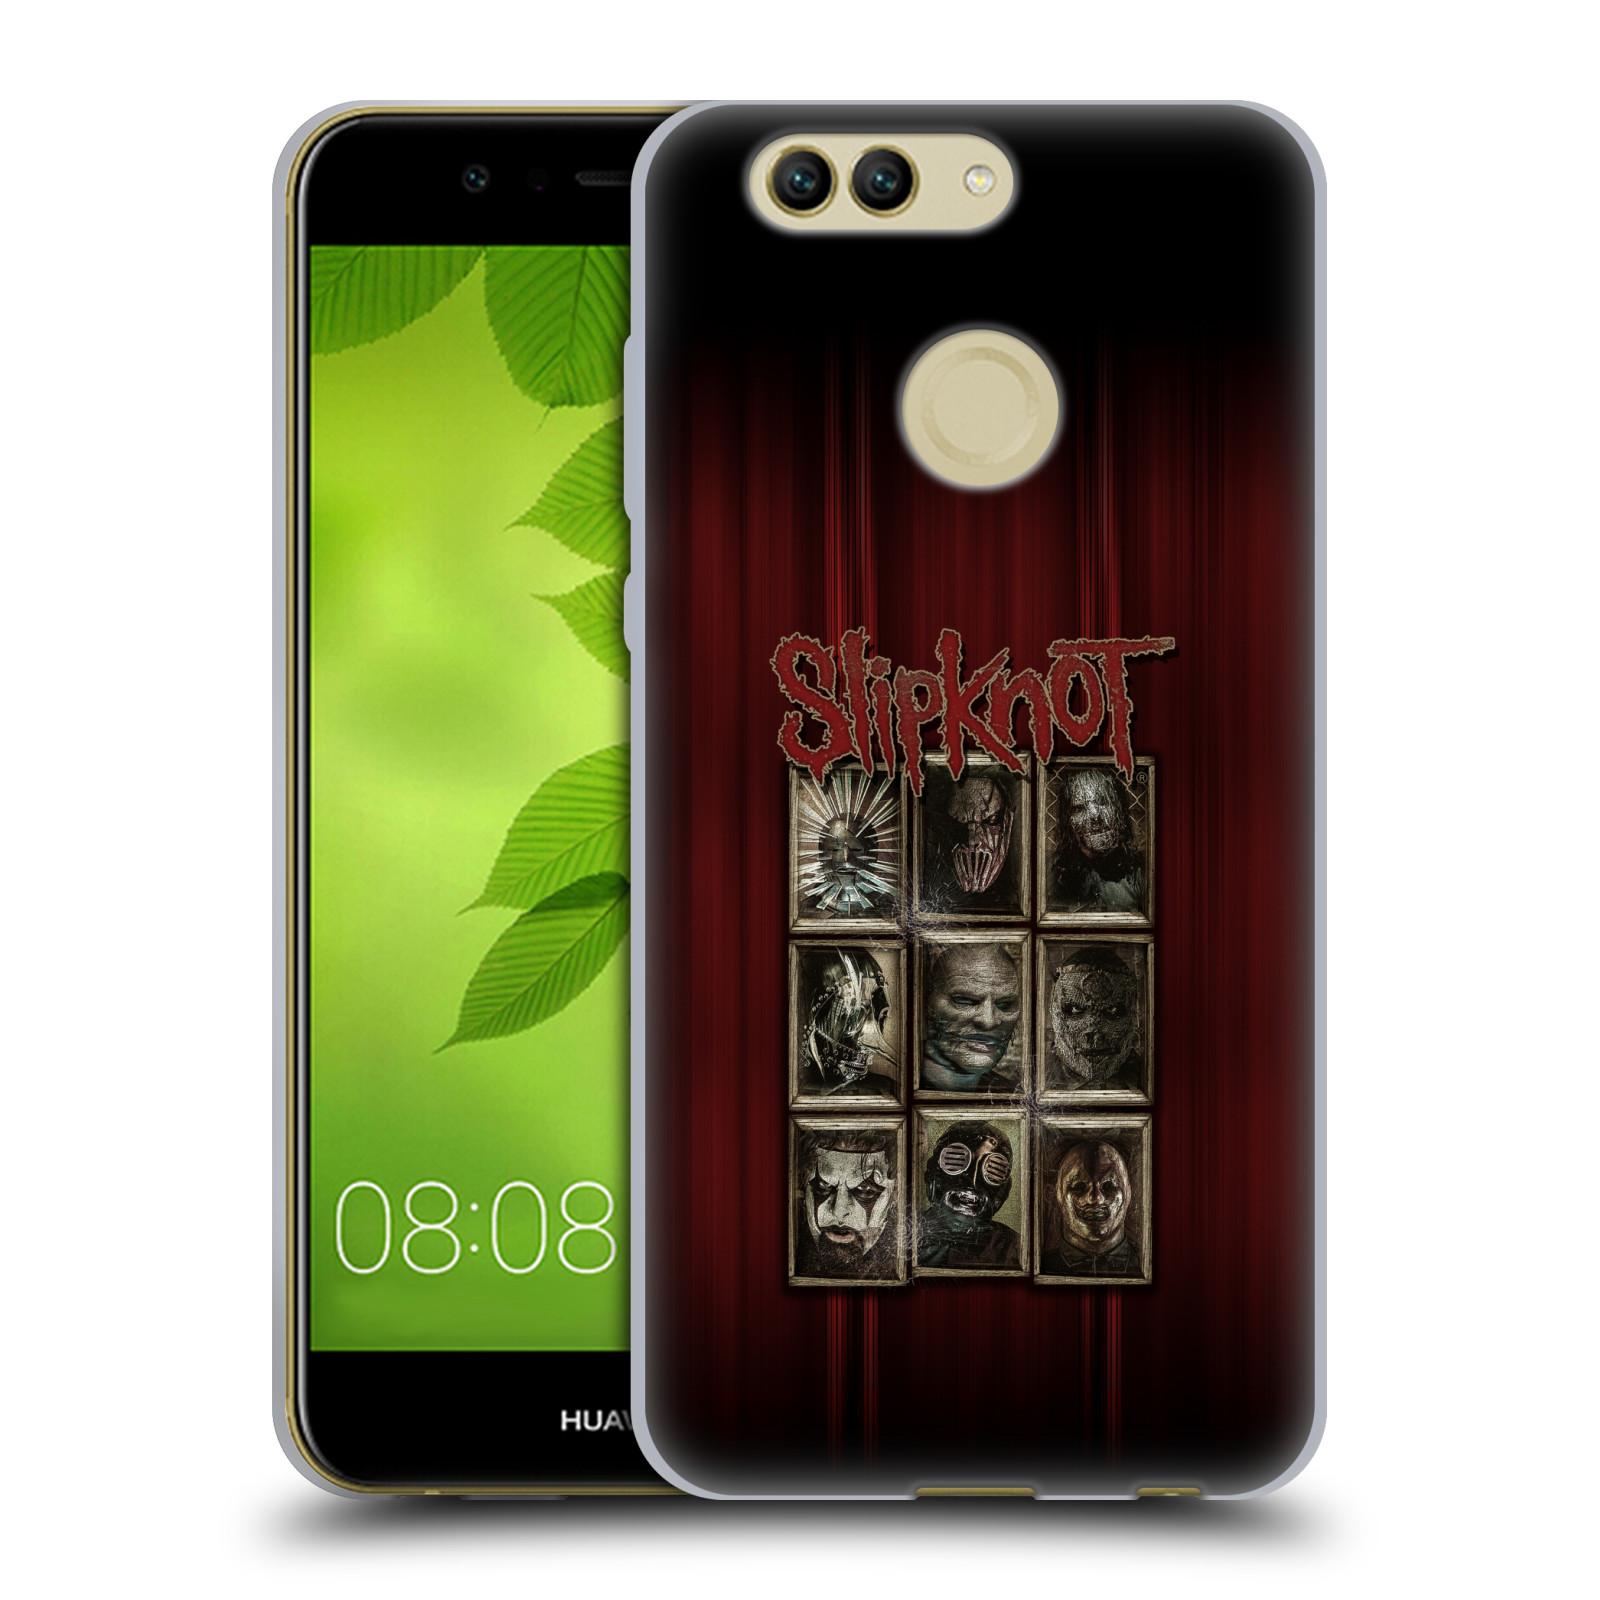 Silikonové pouzdro na mobil Huawei Nova 2 Plus - Head Case - Slipknot - Masky (Silikonový kryt či obal na mobilní telefon Huawei Nova 2 Plus s motivem Slipknot - Masky)